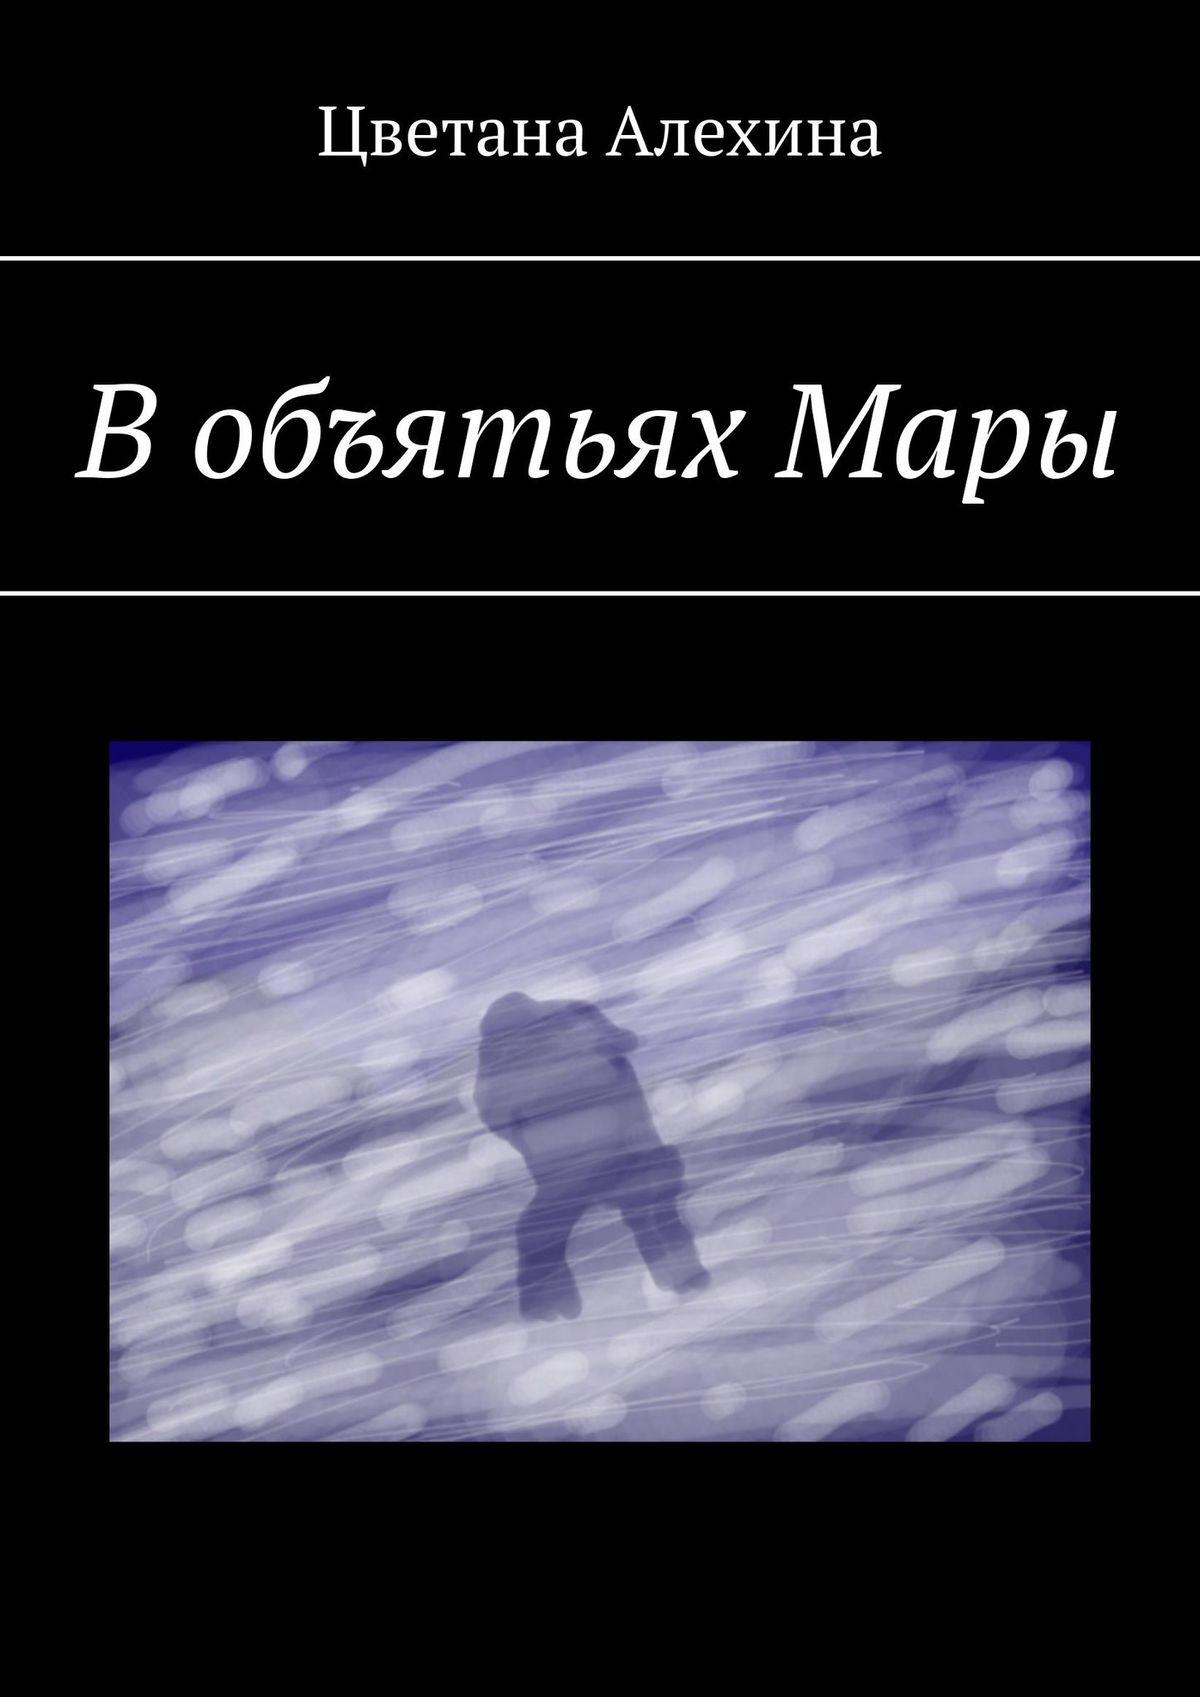 Цветана Алехина ВобъятьяхМары авиабилеты цены норильск